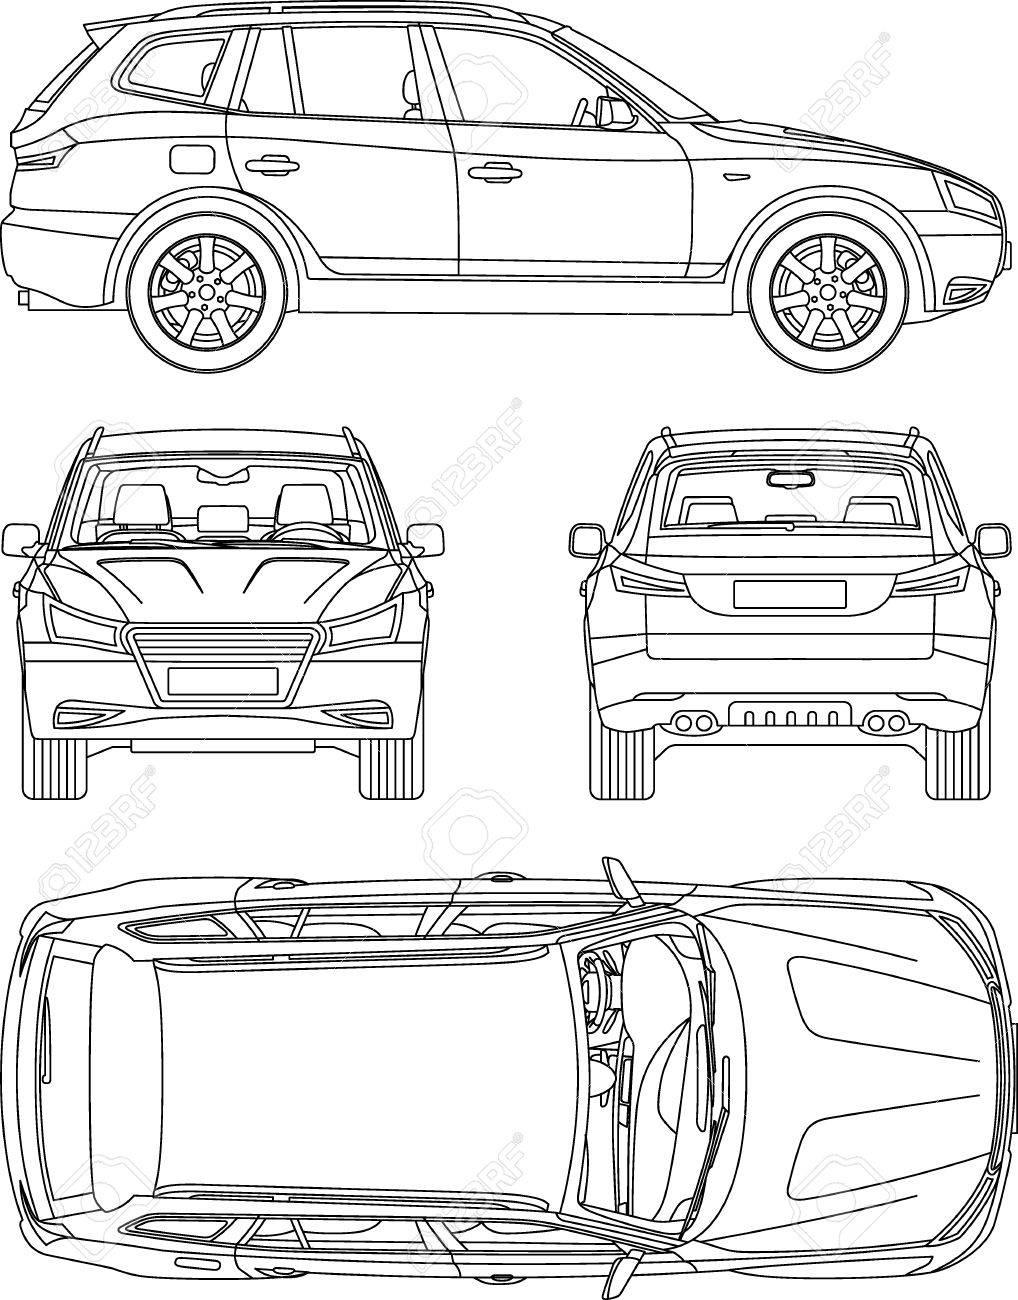 Blueprint Of Car - Dolgular.com